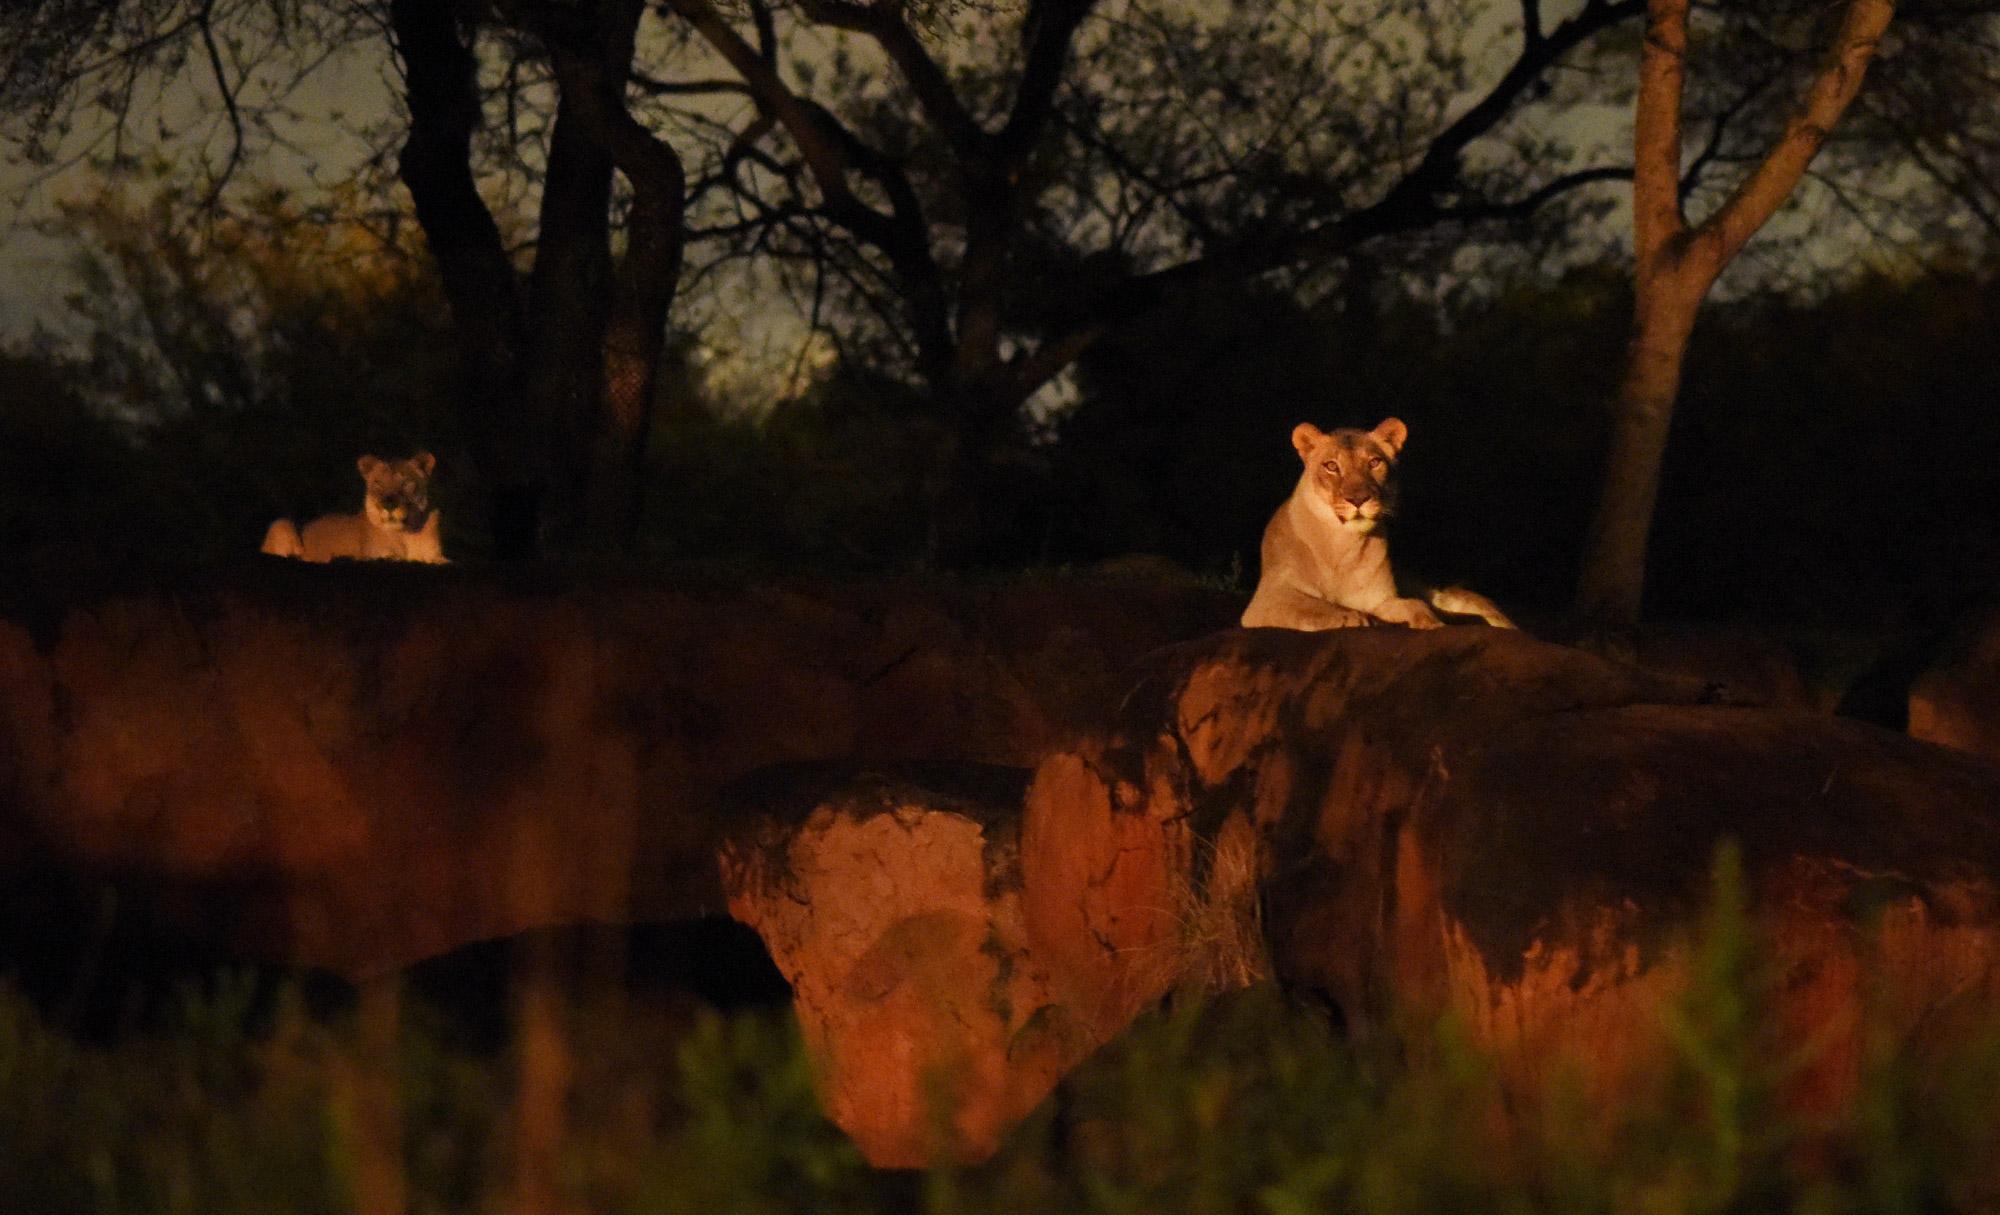 Animal Kingdom S Nighttime Transition To Take Place